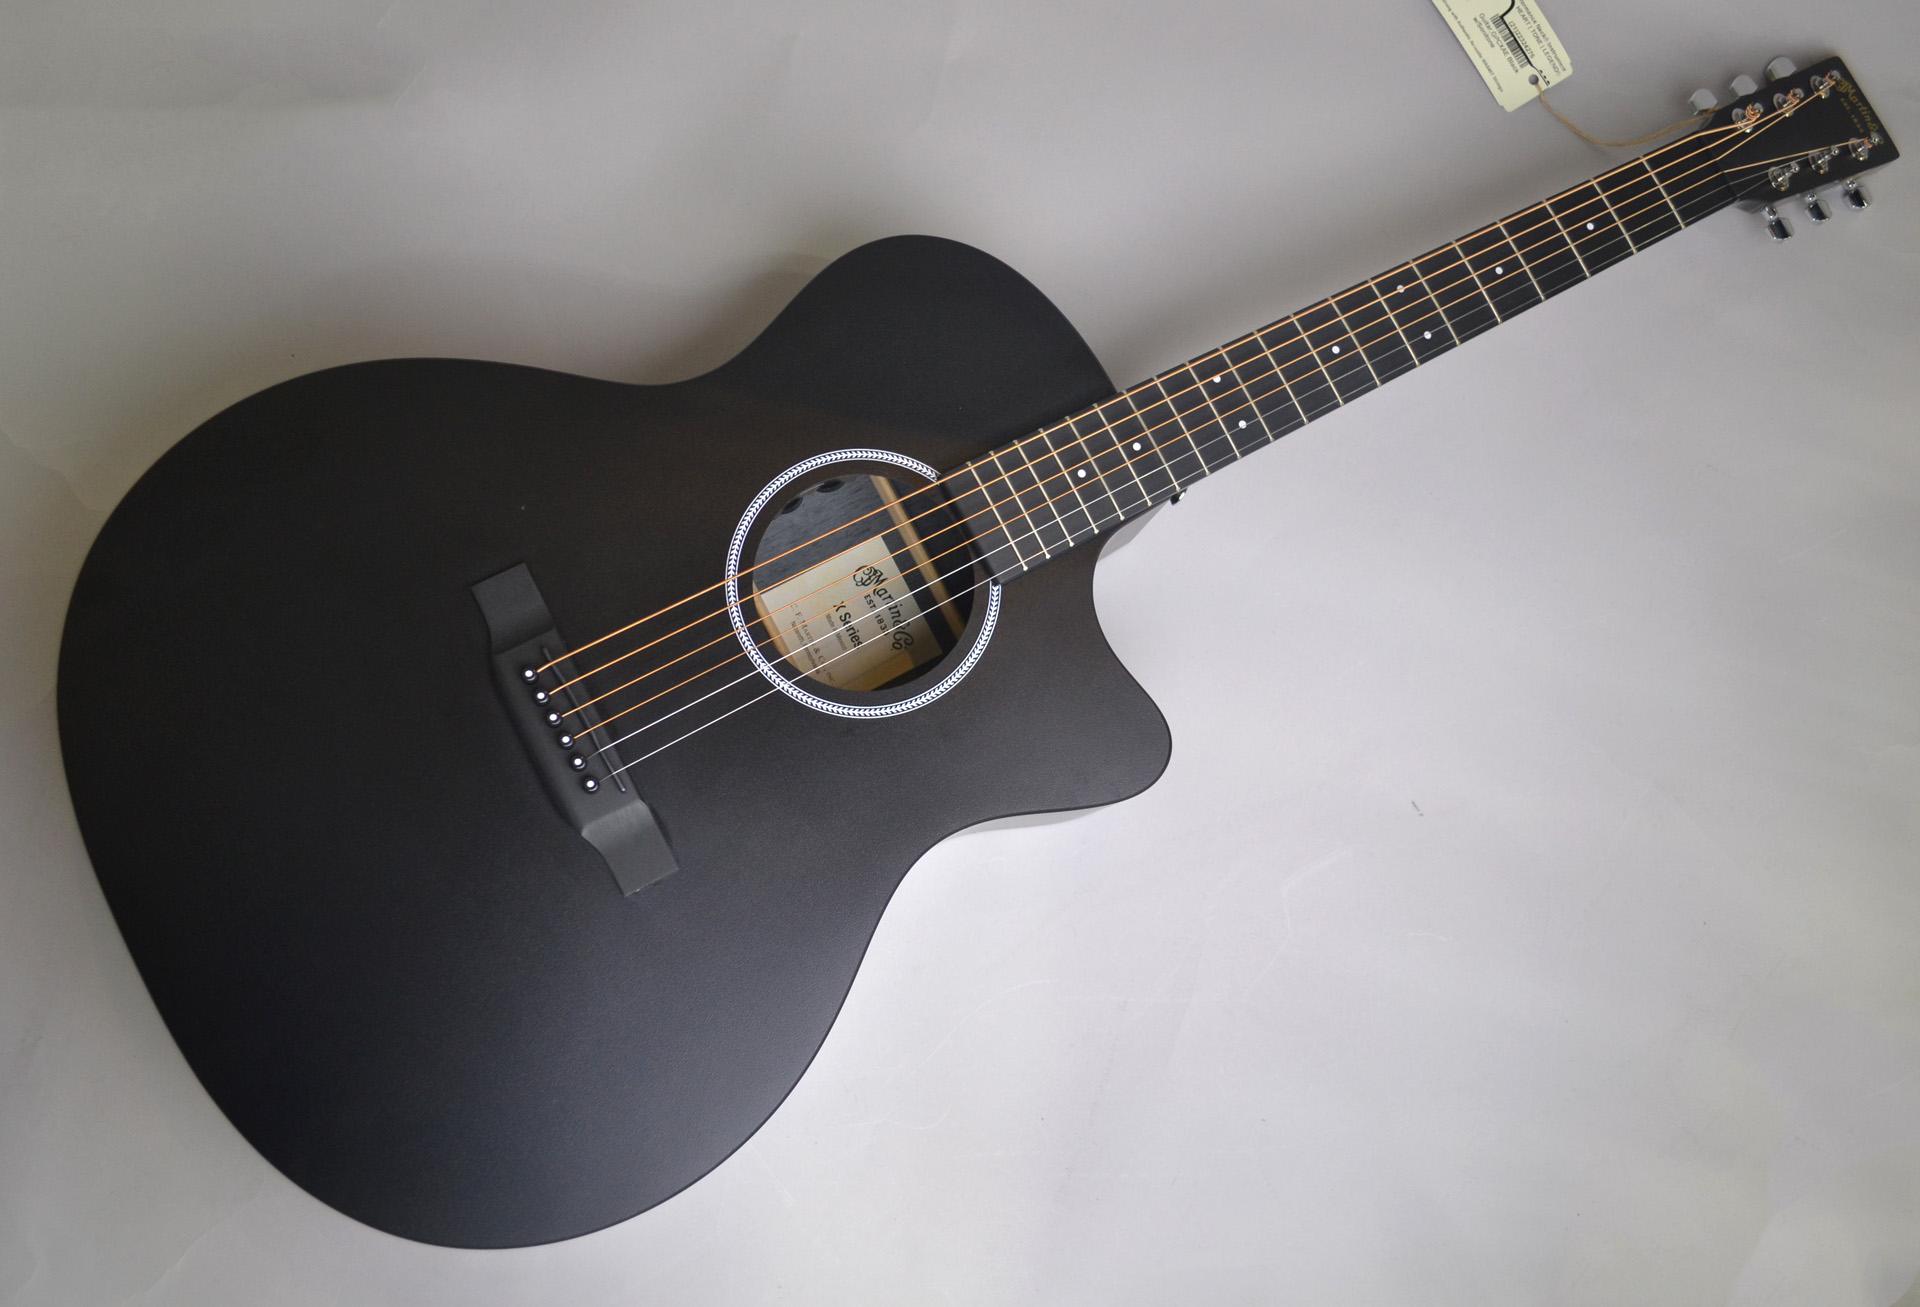 GPCXAE Black